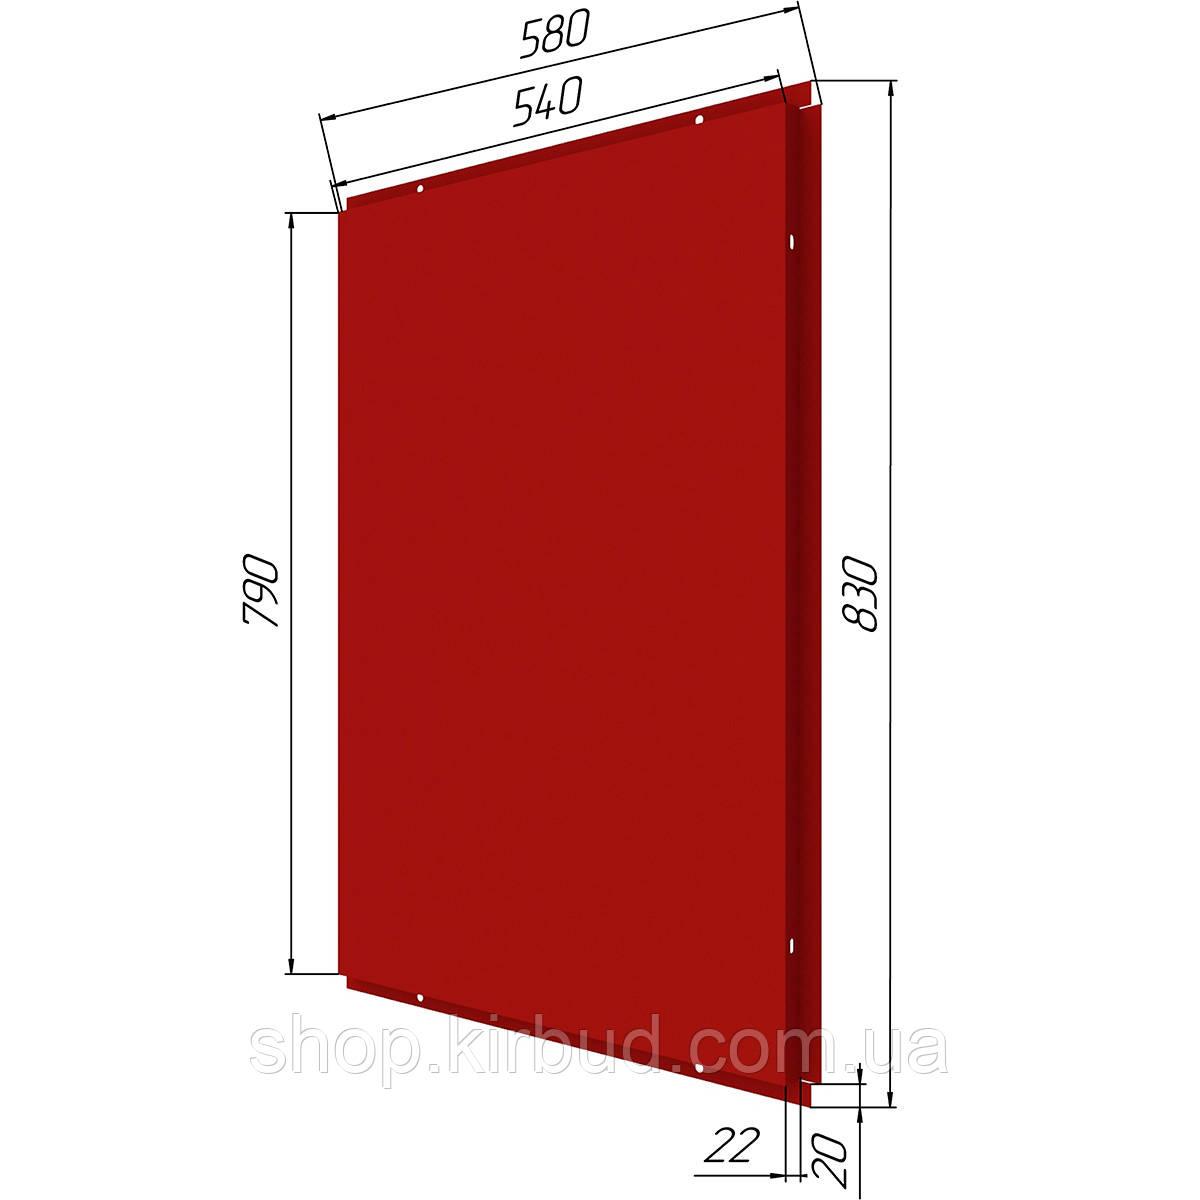 Фасадные касети (под заказ) оцинкованые 0,45мм 580х830мм